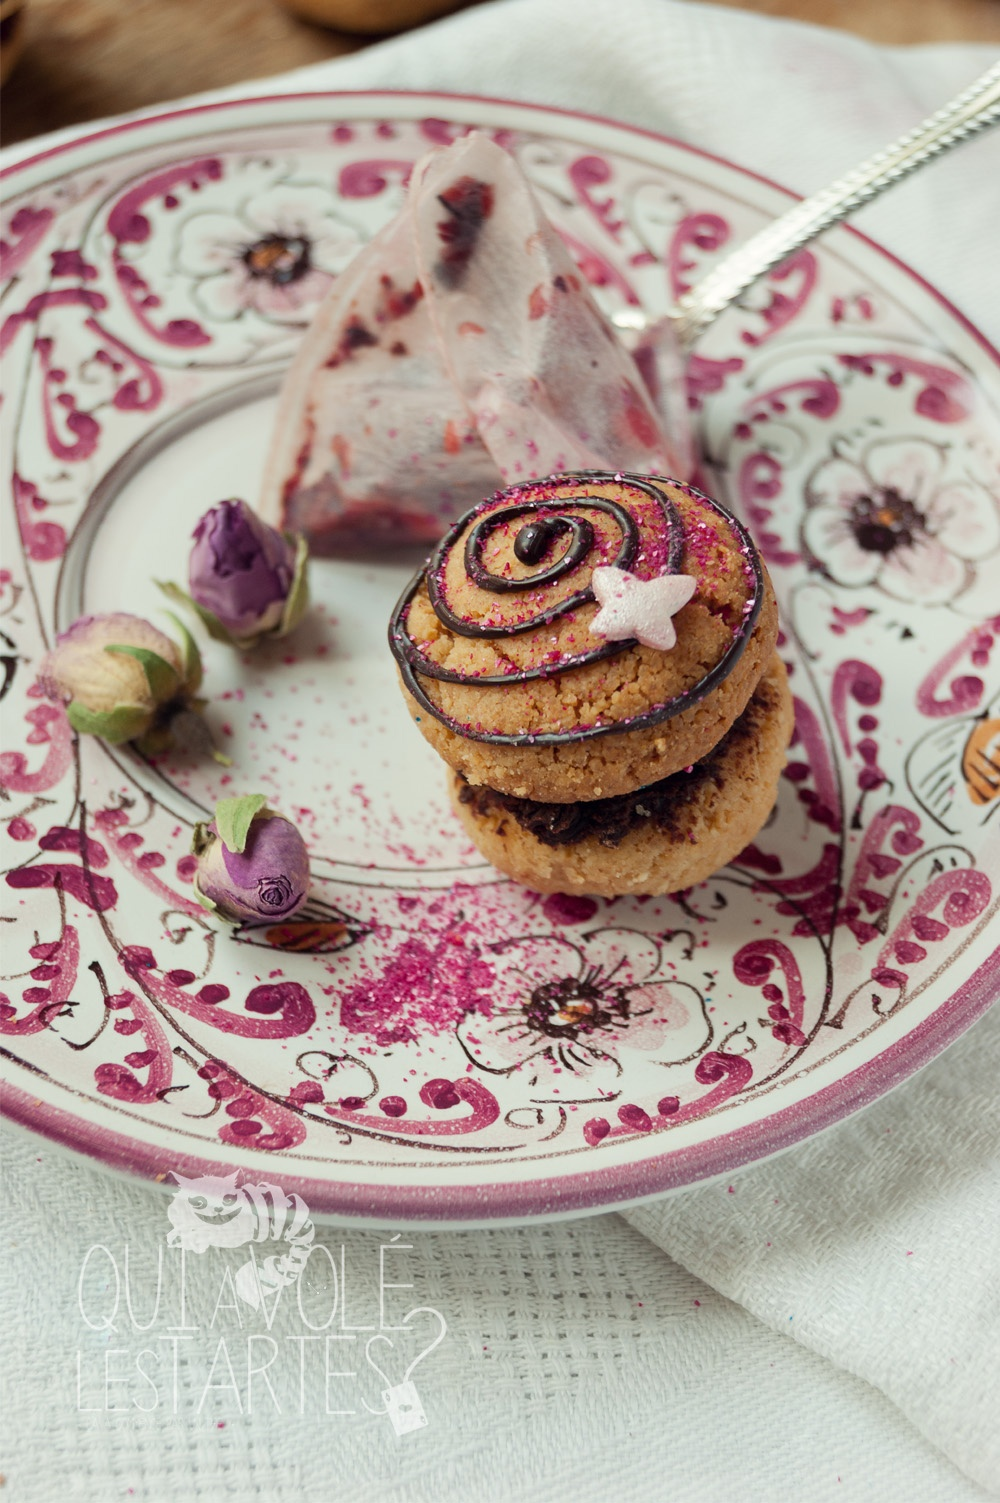 Baci di dama sans gluten - Studio de création - Qui a volé les tartes